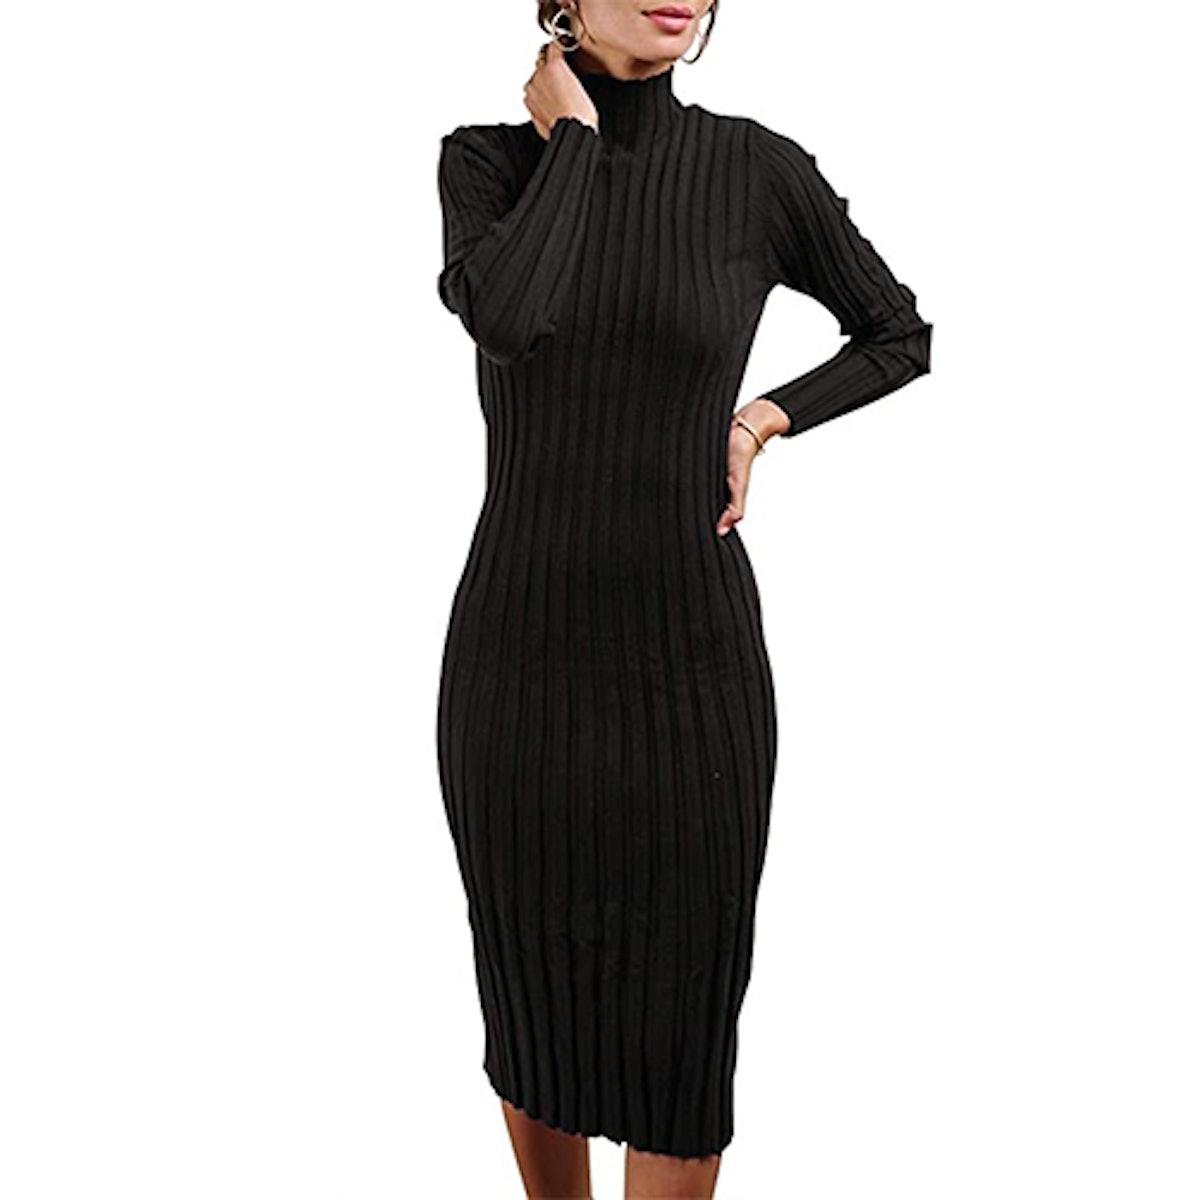 MEROKEETY Ribbed Long Sleeve High Neck Midi Dress